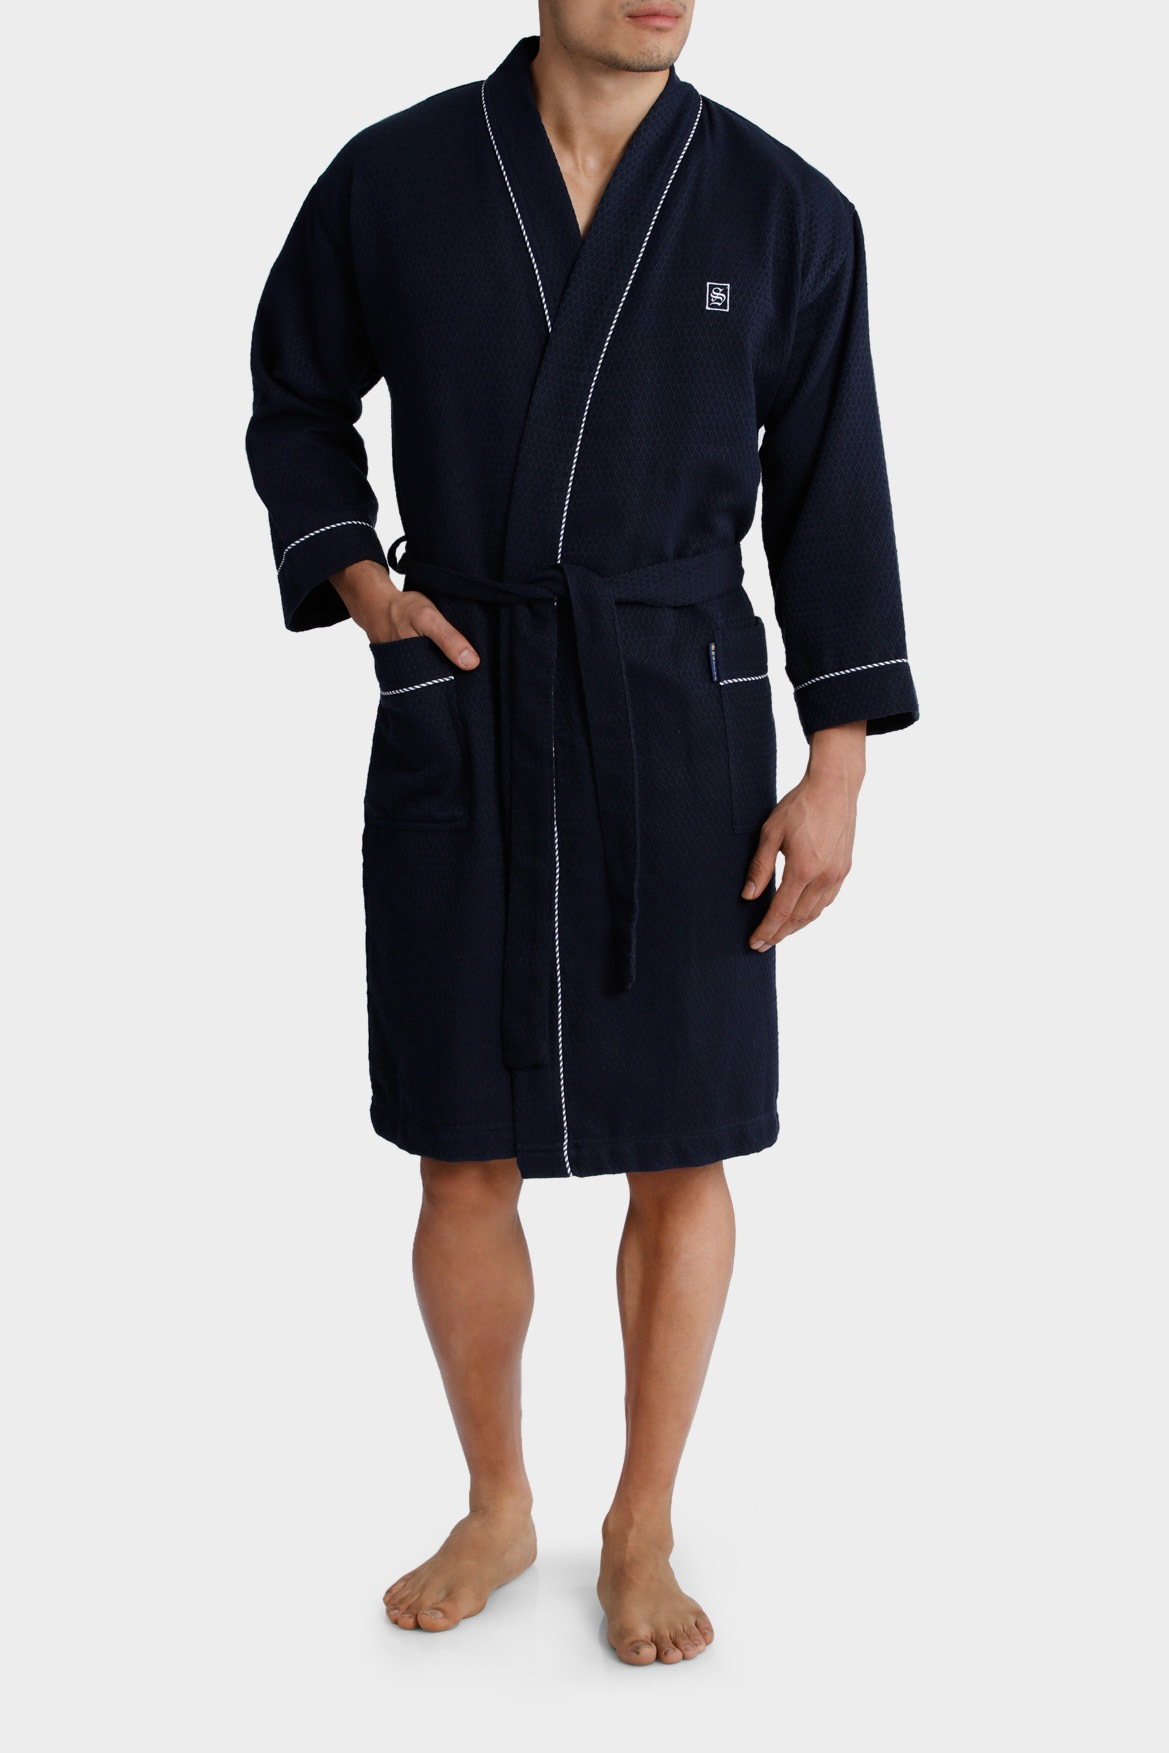 Mens Robes   Buy Robes For Men Online   Myer